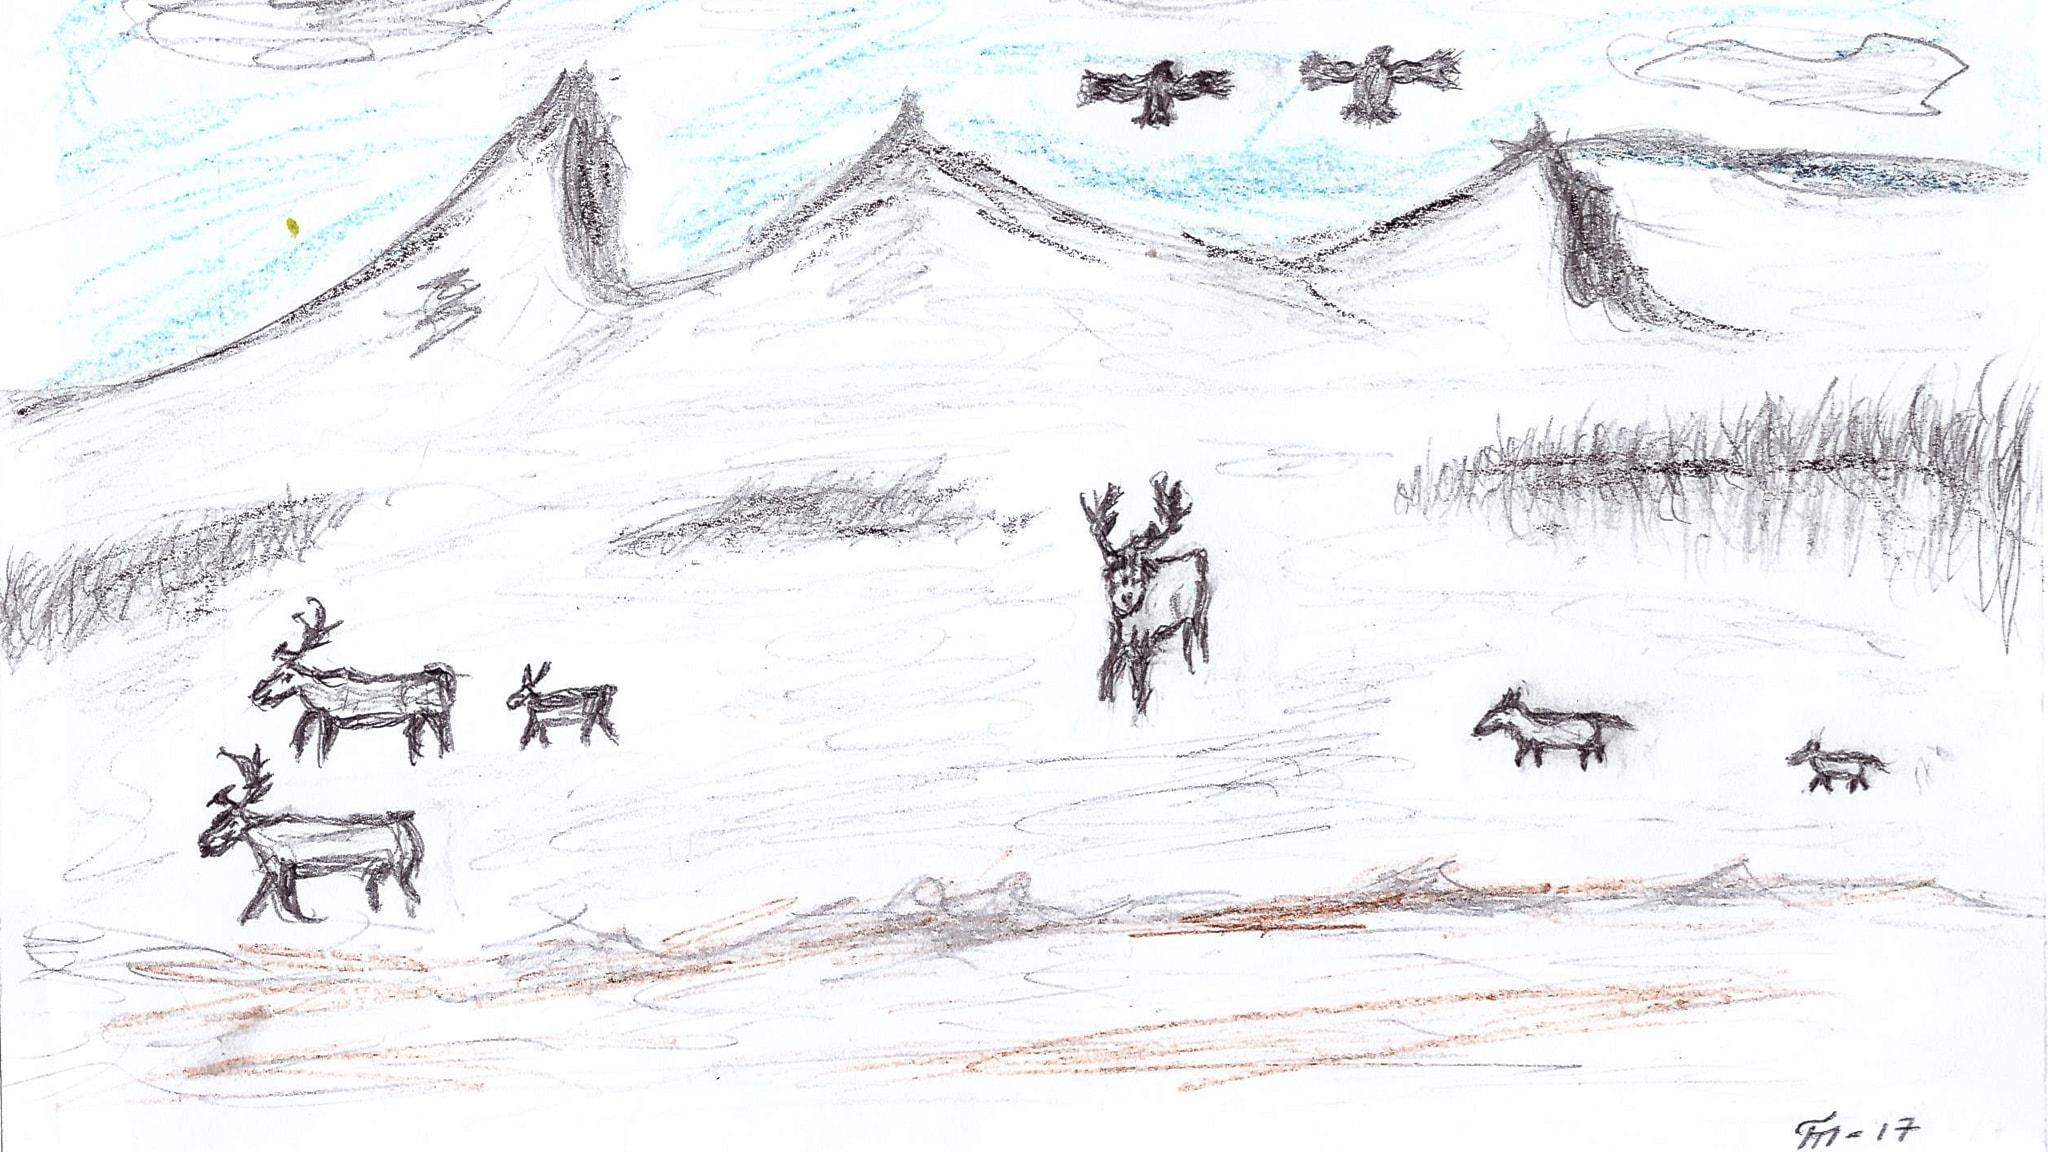 Hilbbán - oassi 3 - spela